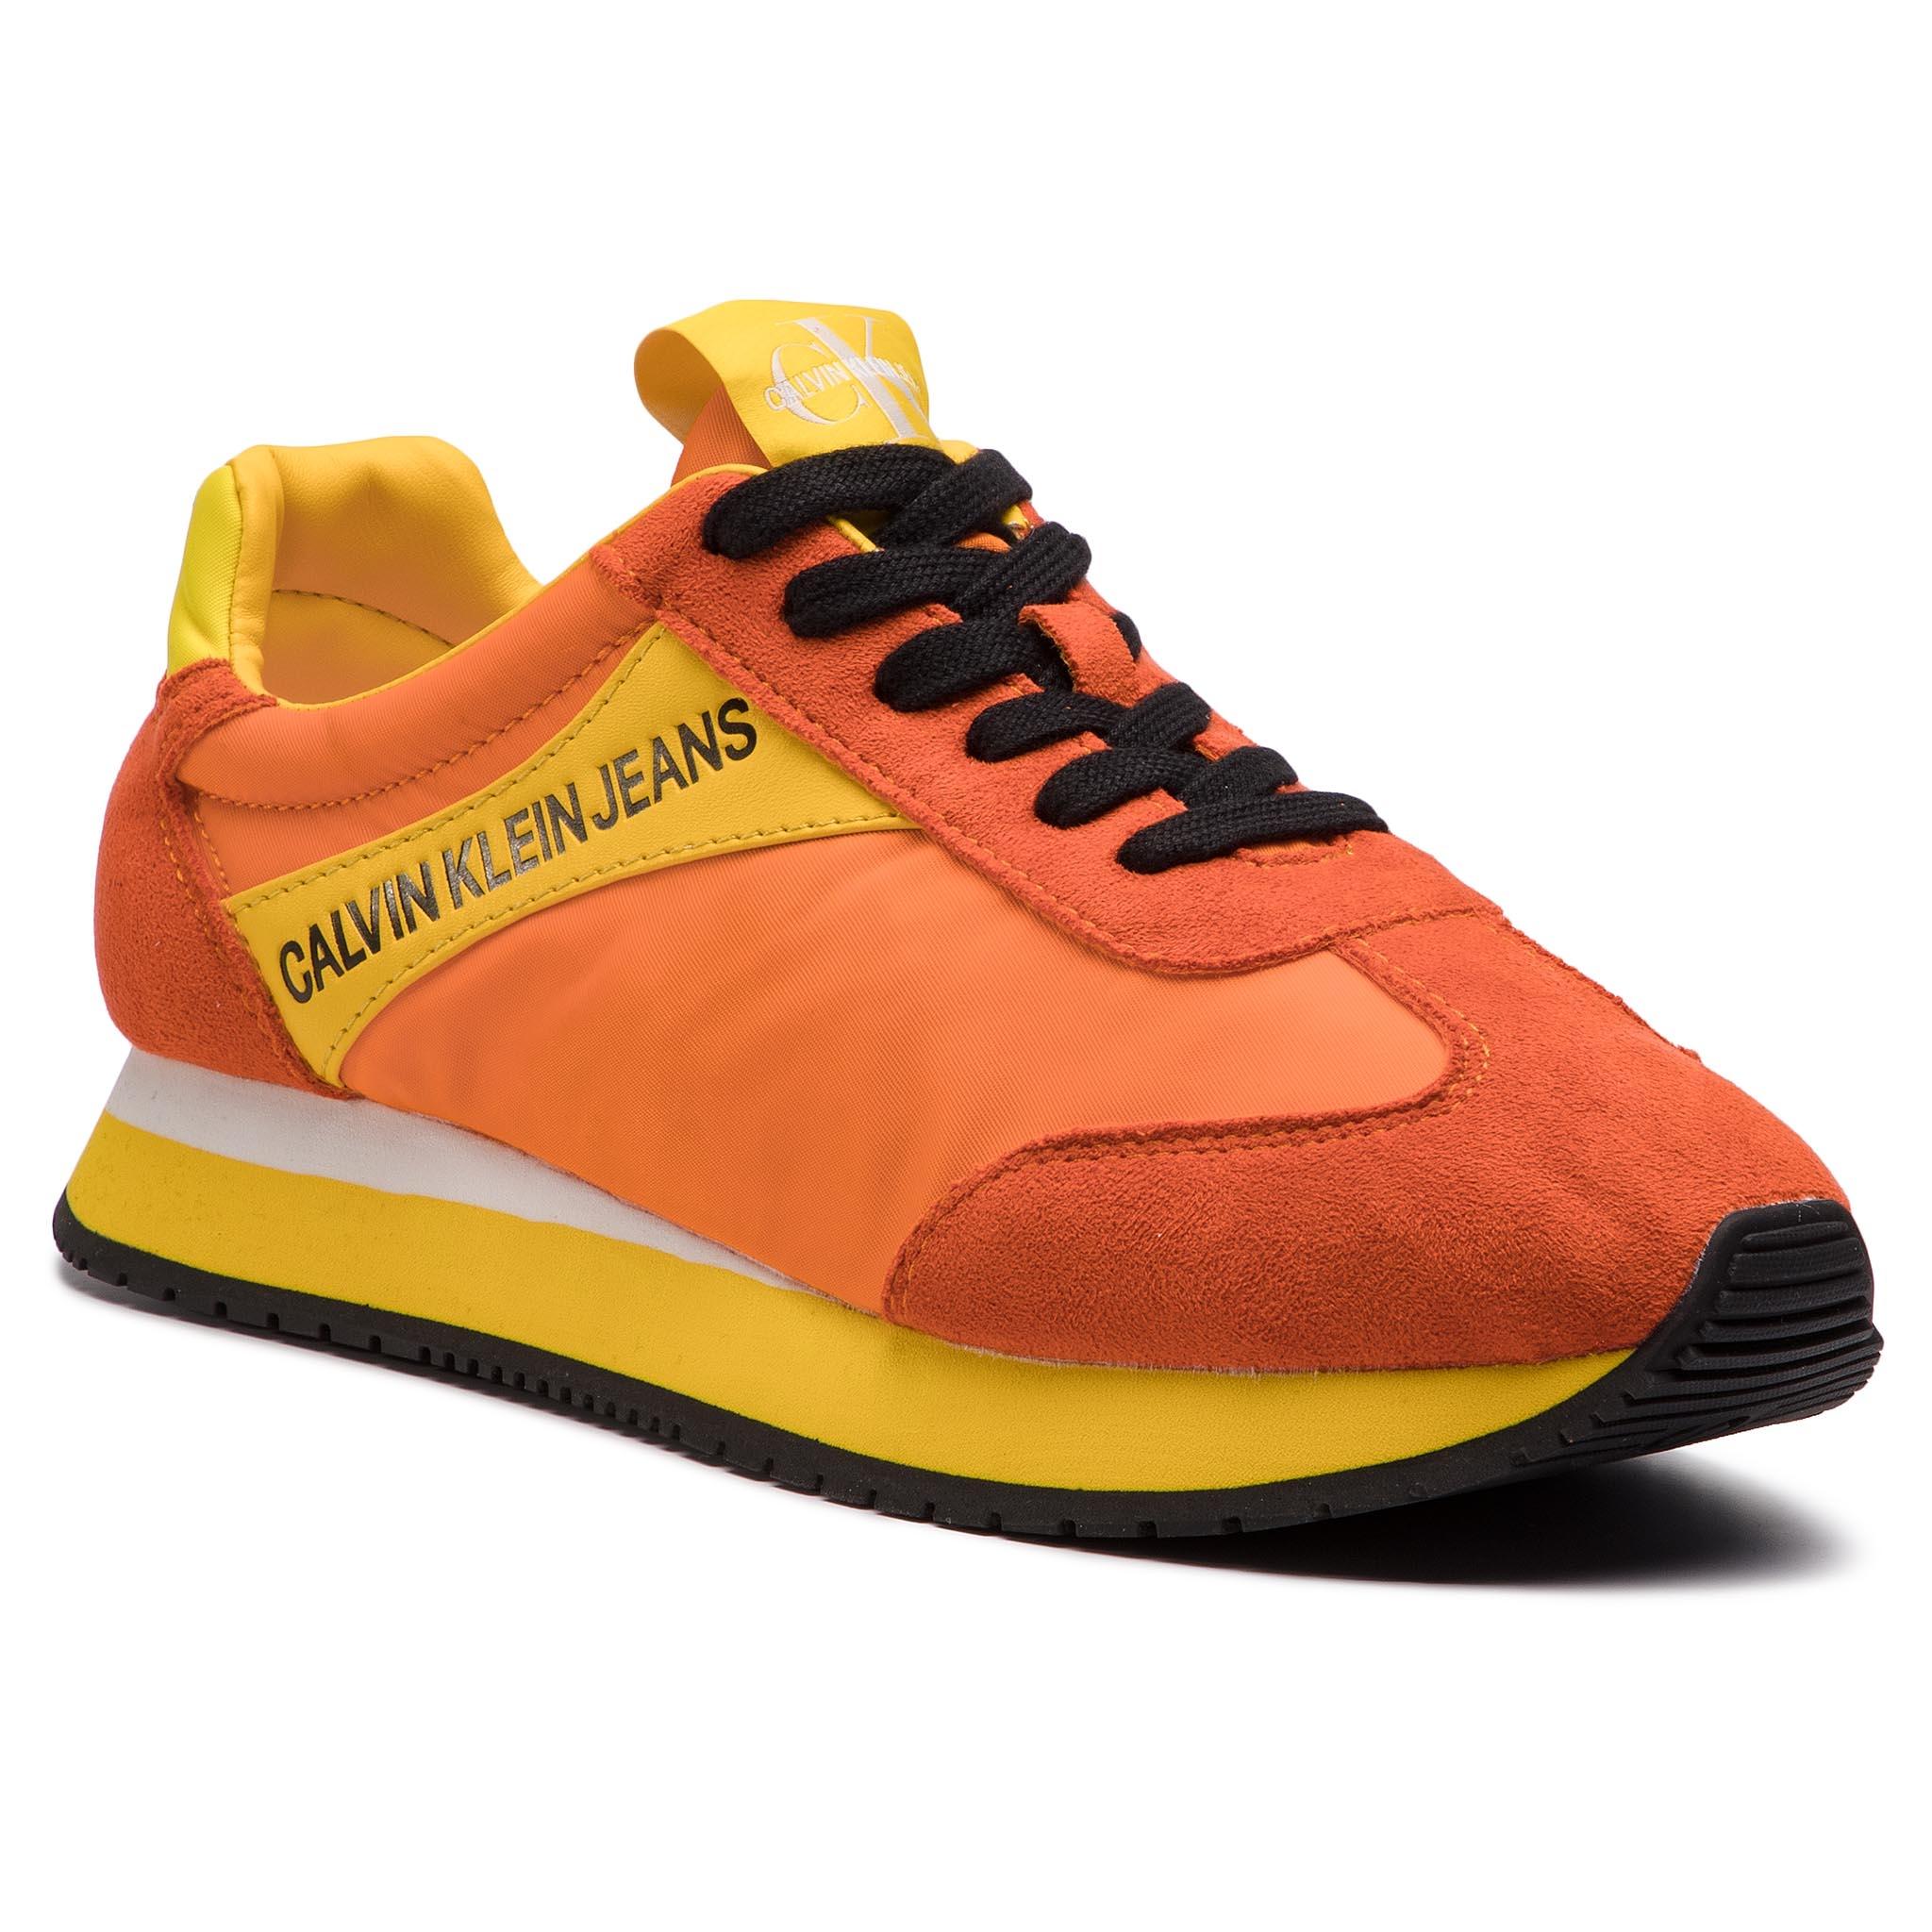 Image of Sneakers CALVIN KLEIN JEANS - Jerrold S0615 Multi Orange